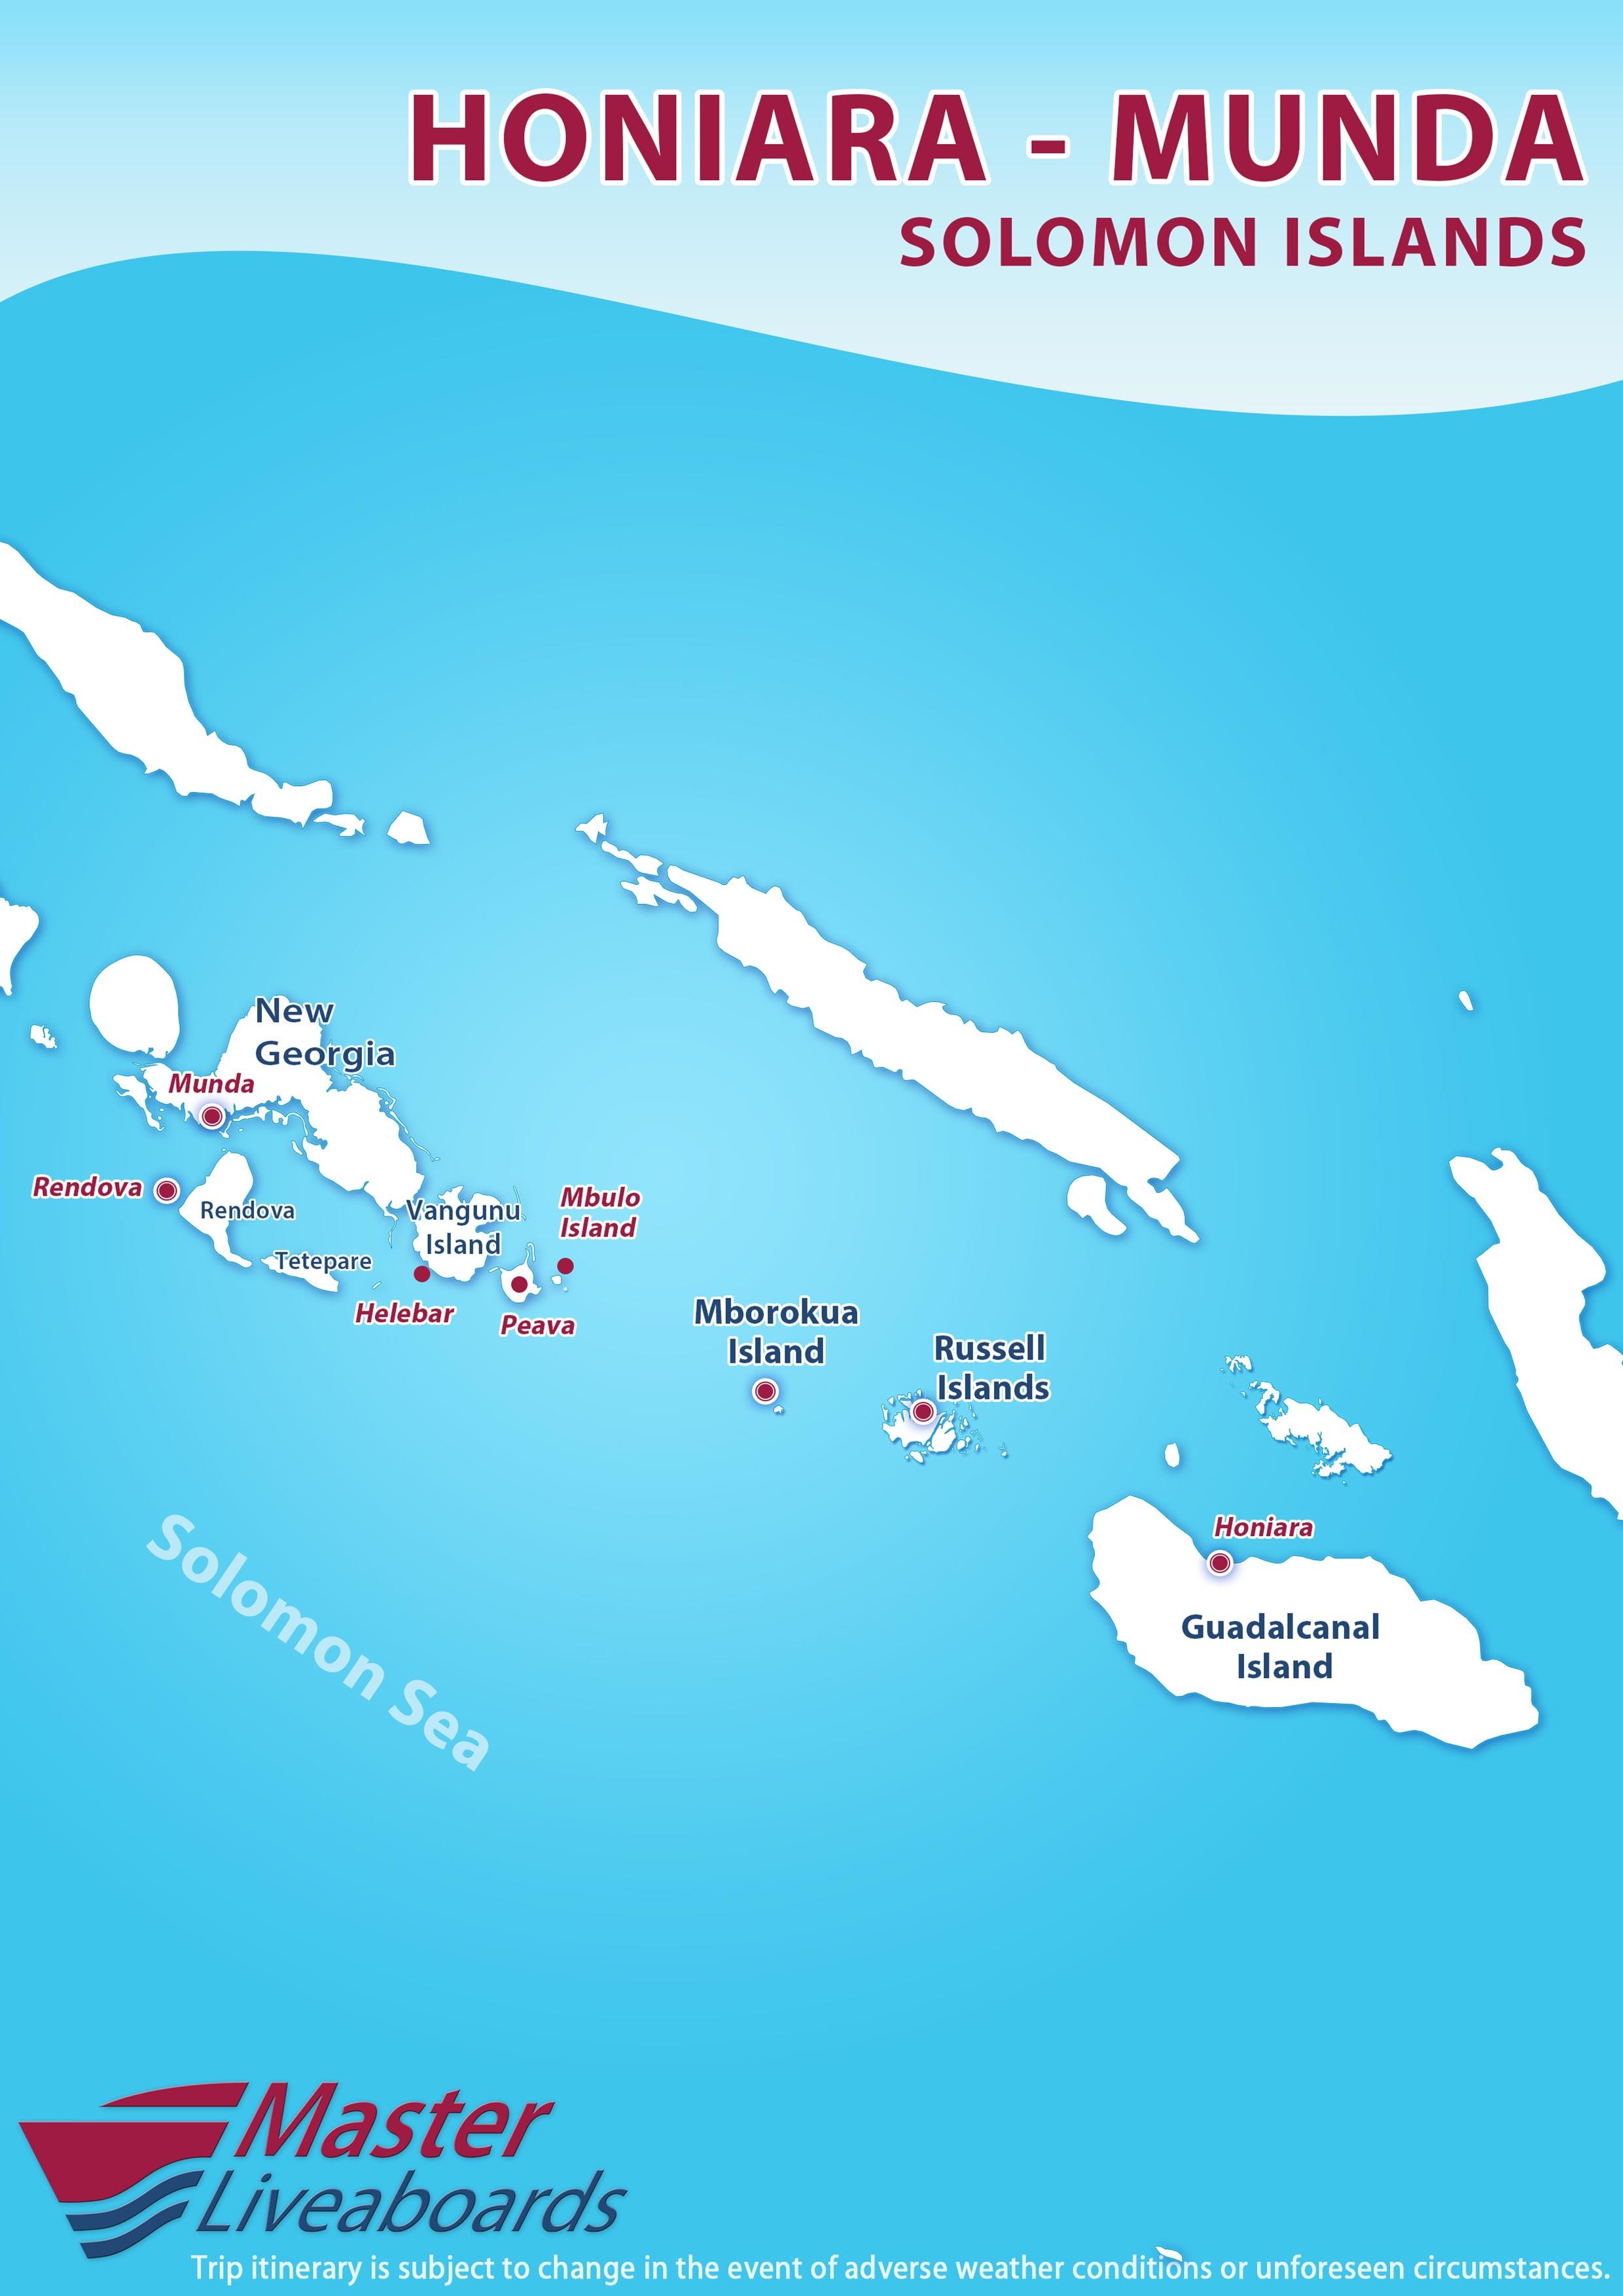 honiara_to_munda_solomon_islands_lr1.jpg